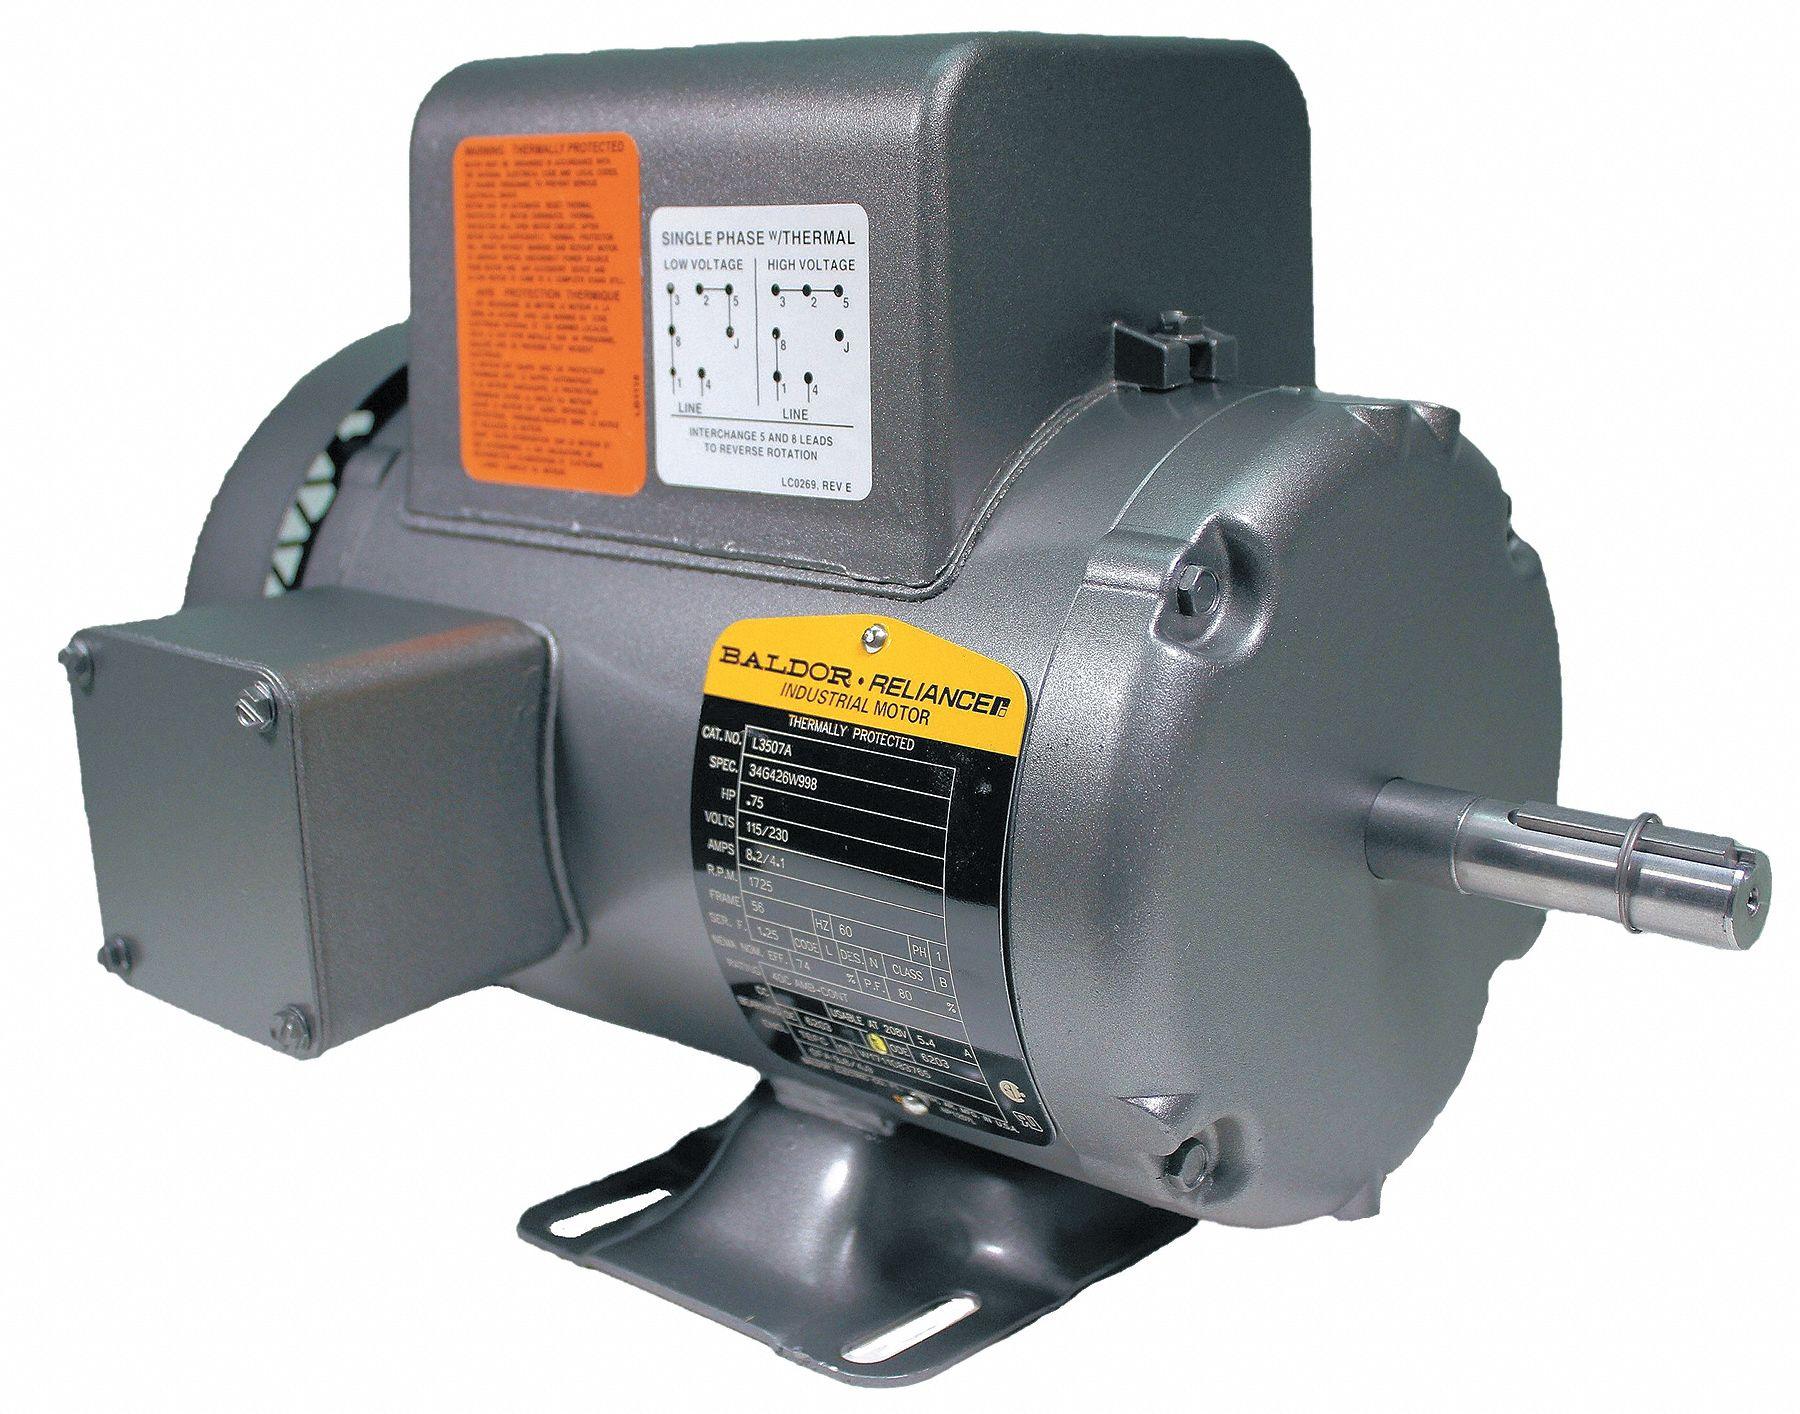 Baldor Electric Motor 3 4 Hp 1725 Rpm 115 230v 56 Tefc